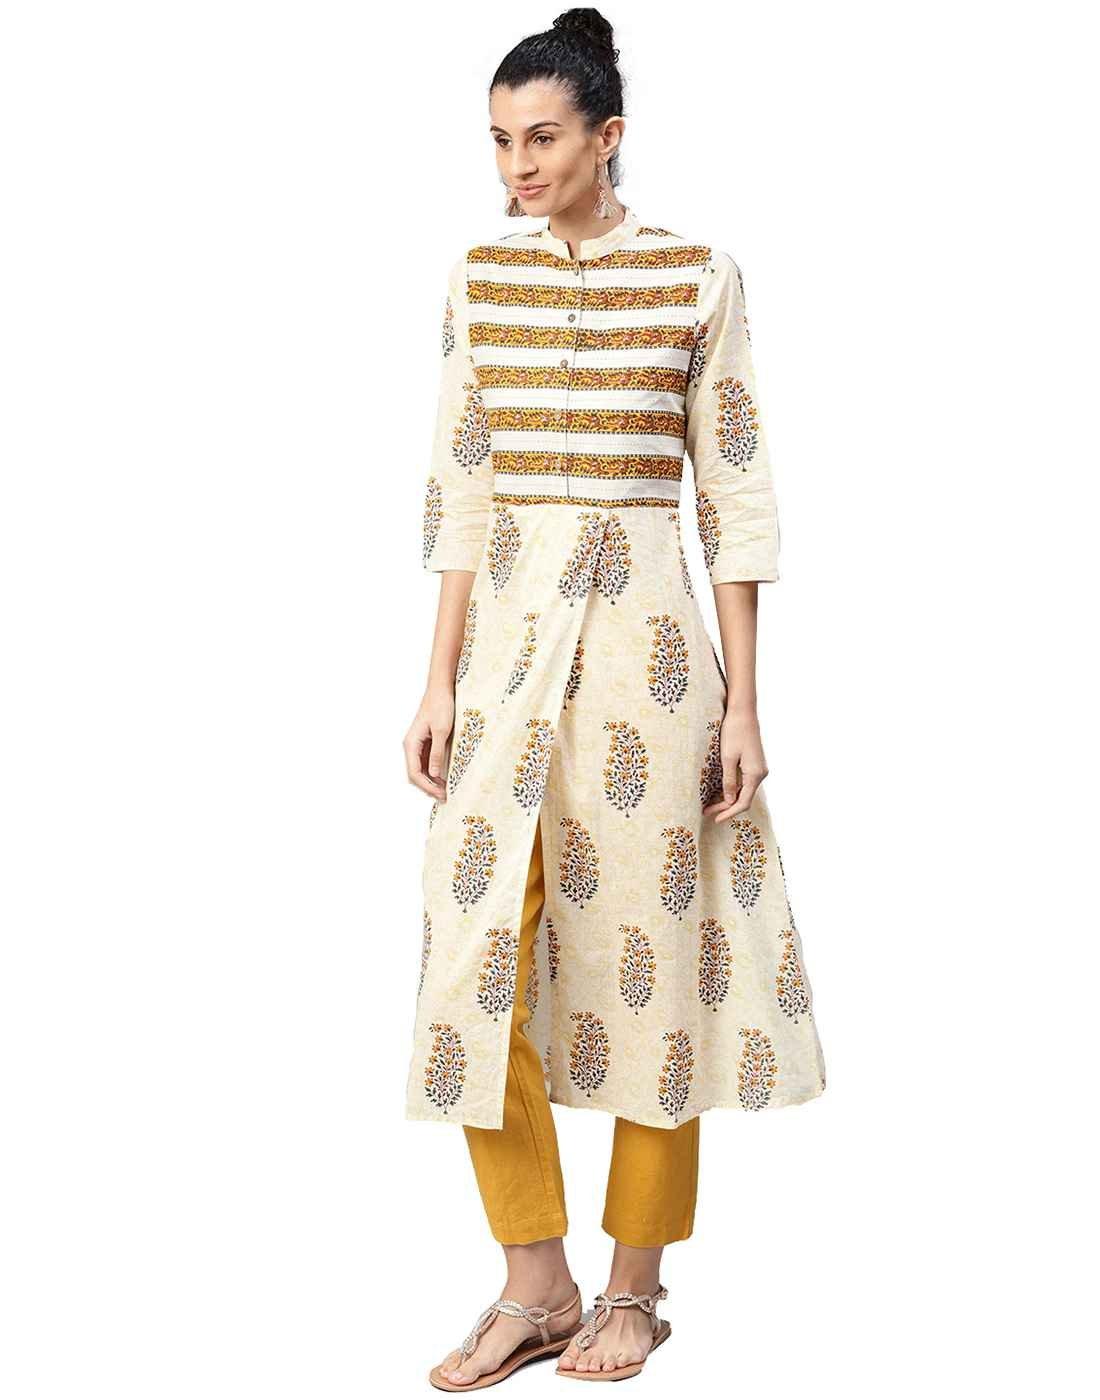 Jaipur Kurti Women Indian Casual Ethnic Motifs Tunic Top A-Line Cotton Kurta (Cream)